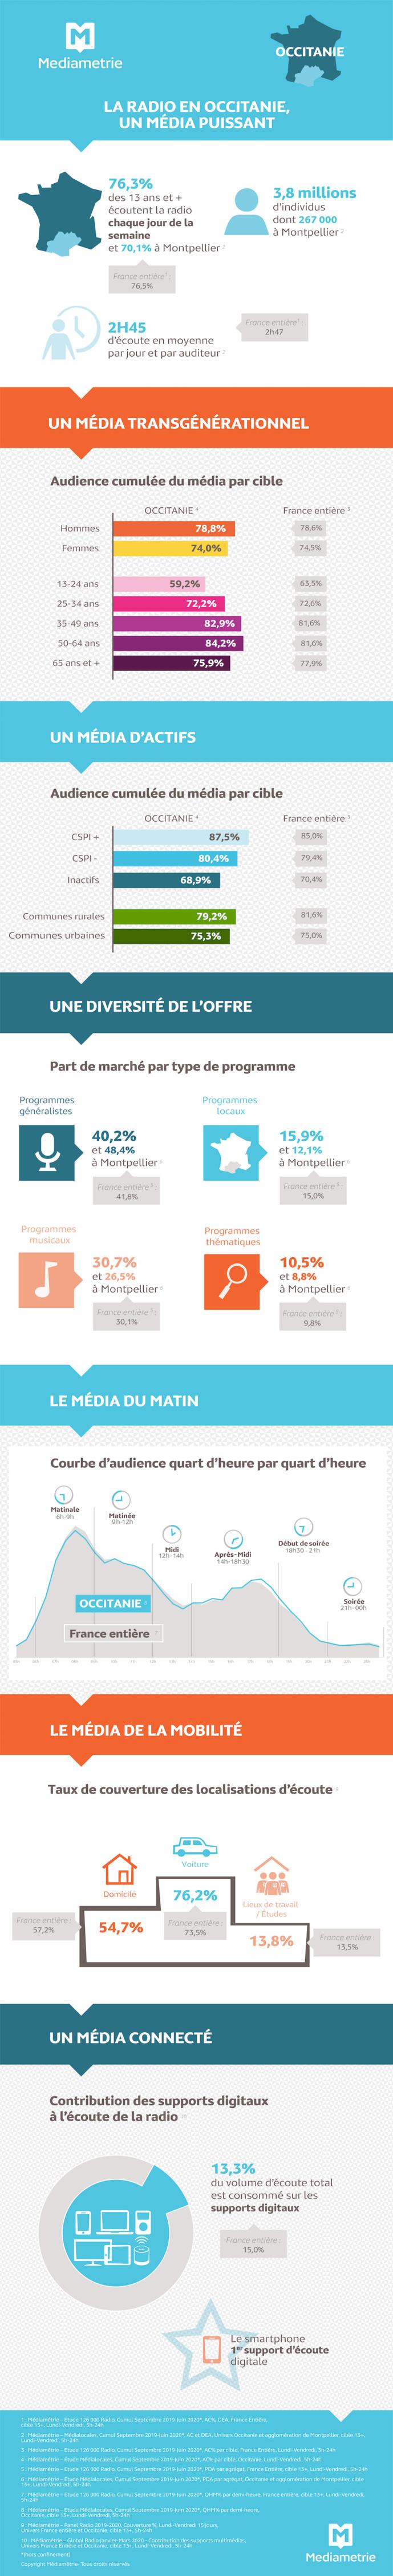 RadioTour : l'audience de la radio en Occitanie